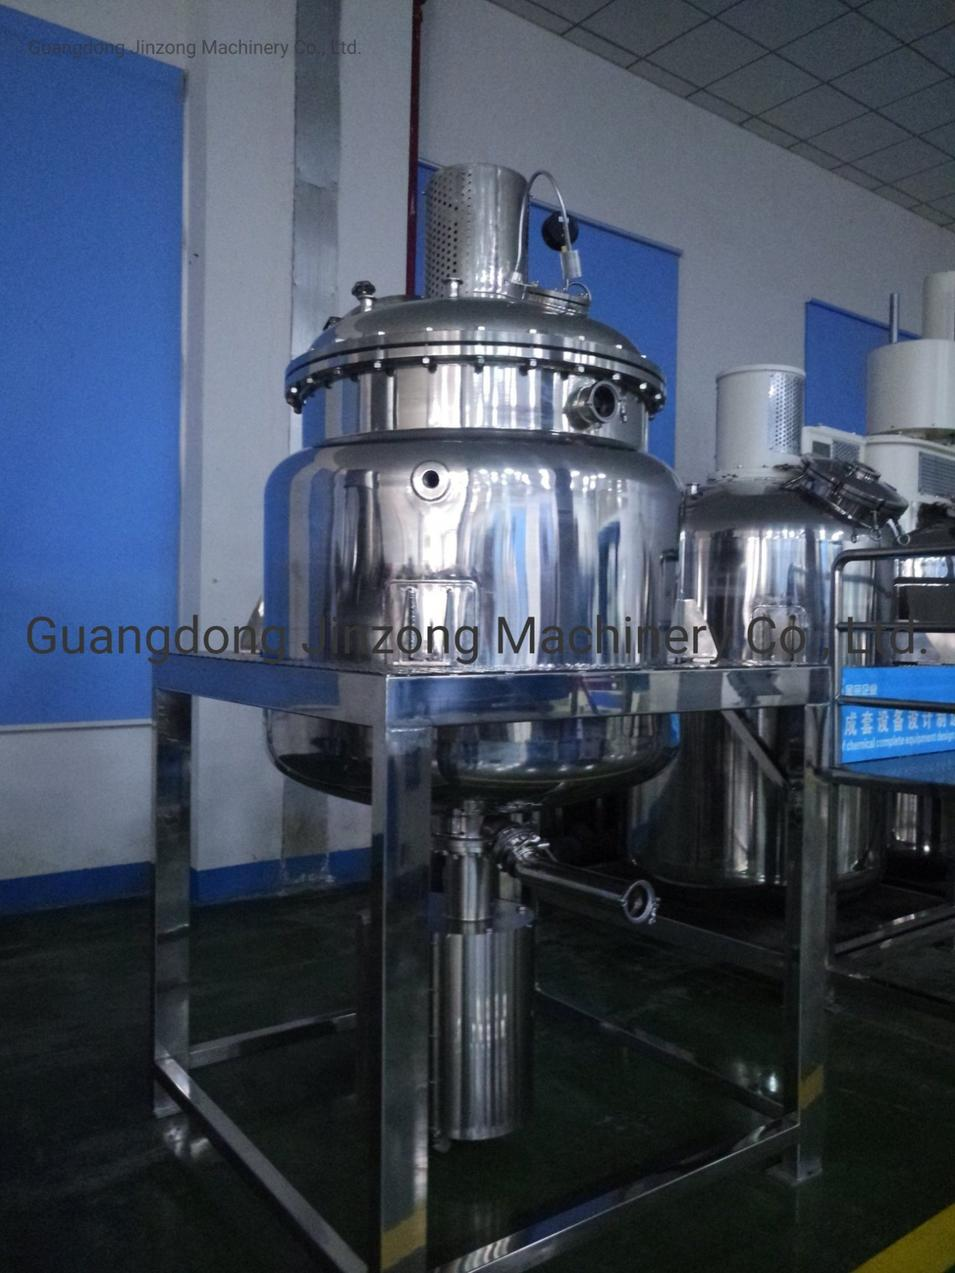 Heat-Transfer Conduction Oil Pharmaceutical Reactor 50-10000 Liter